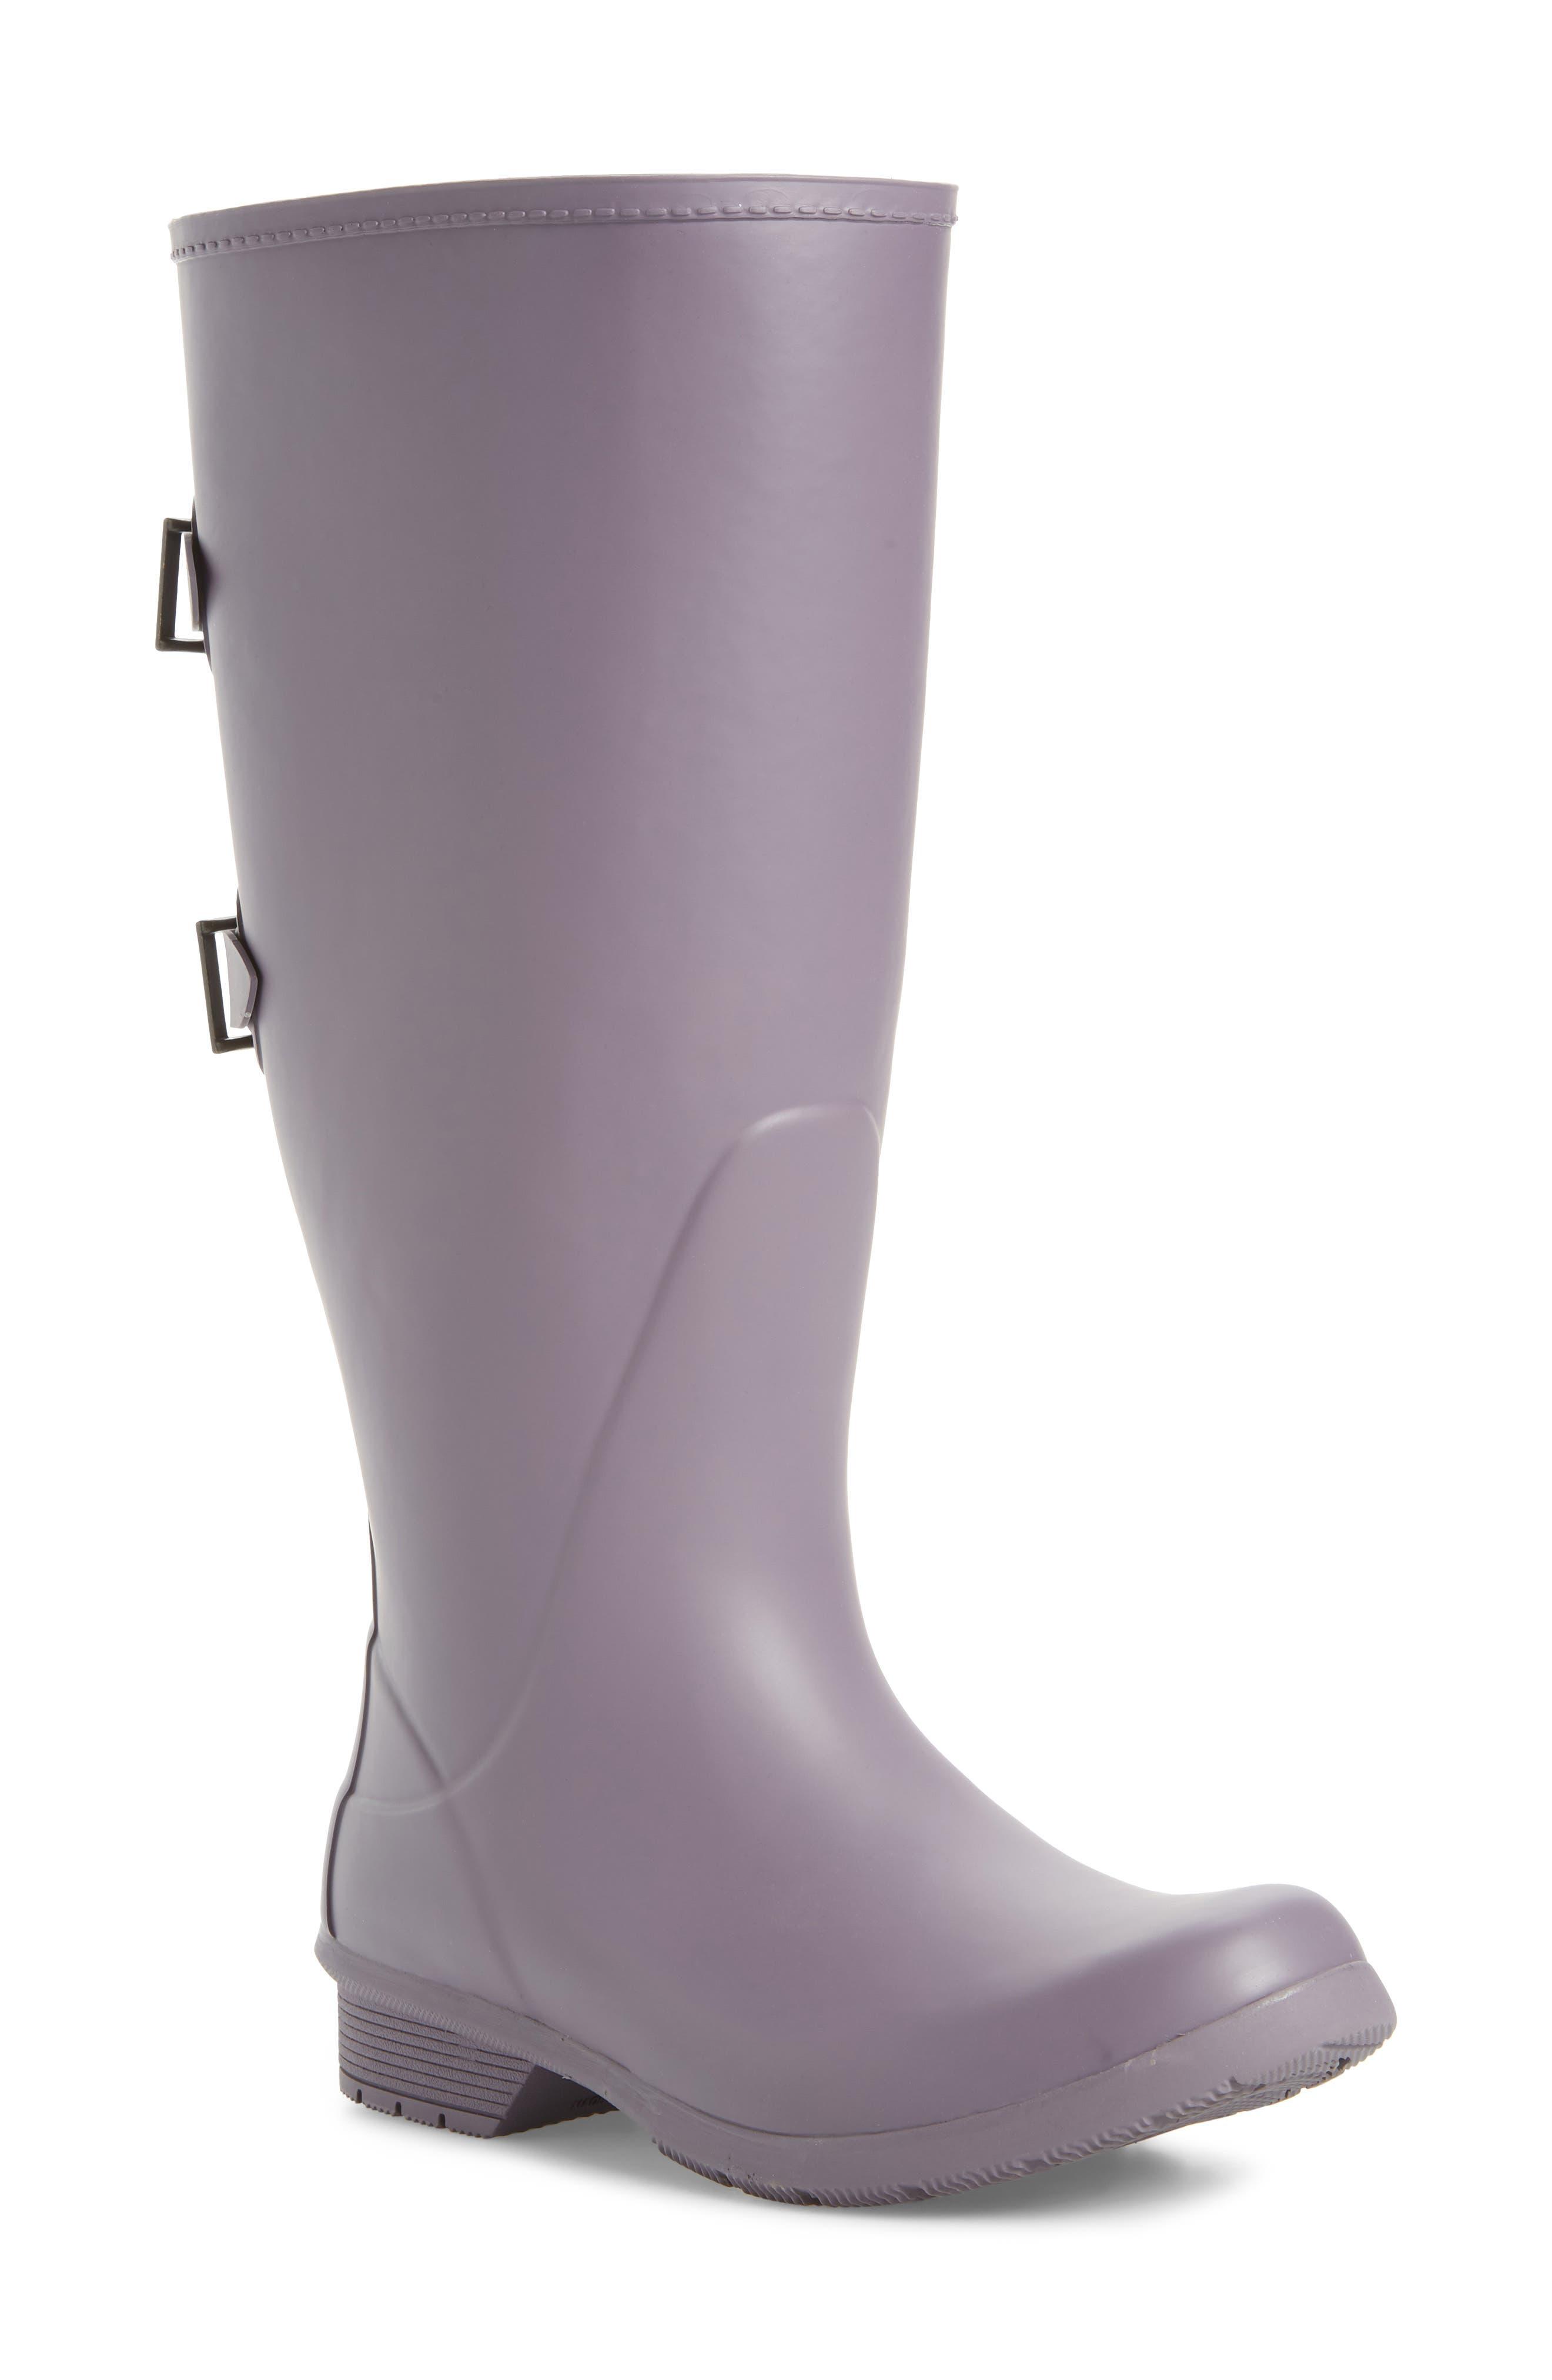 Versa Prima Tall Rain Boot,                         Main,                         color, Mulberry